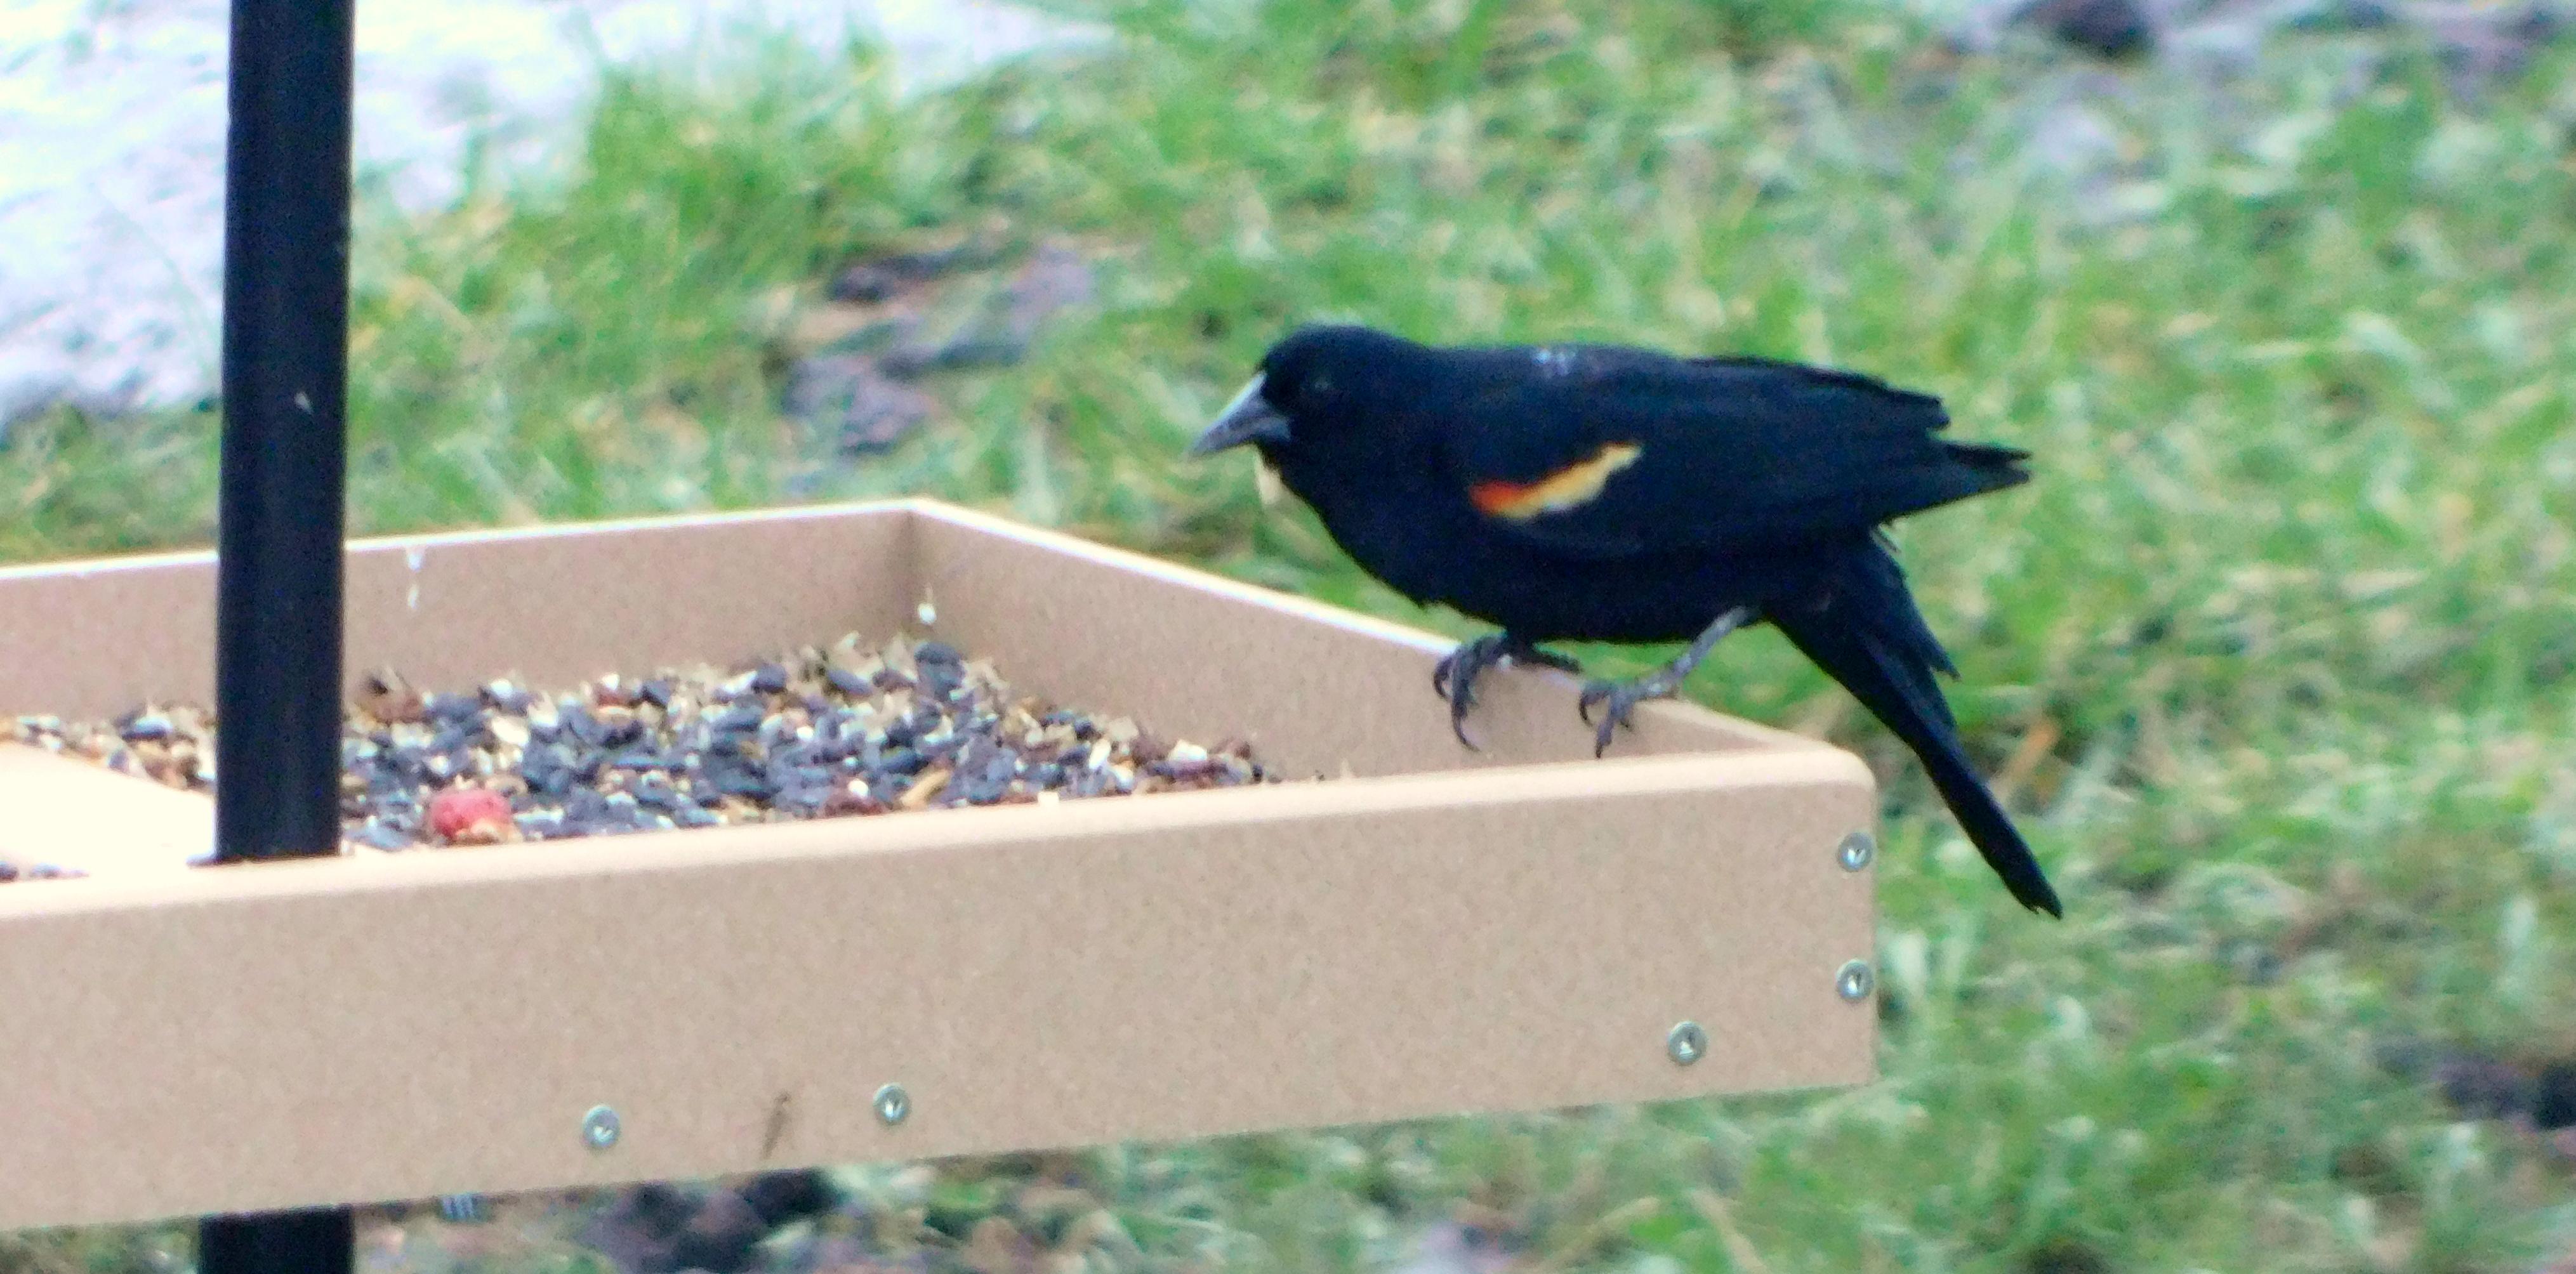 Red-winged Blackbird at feeder